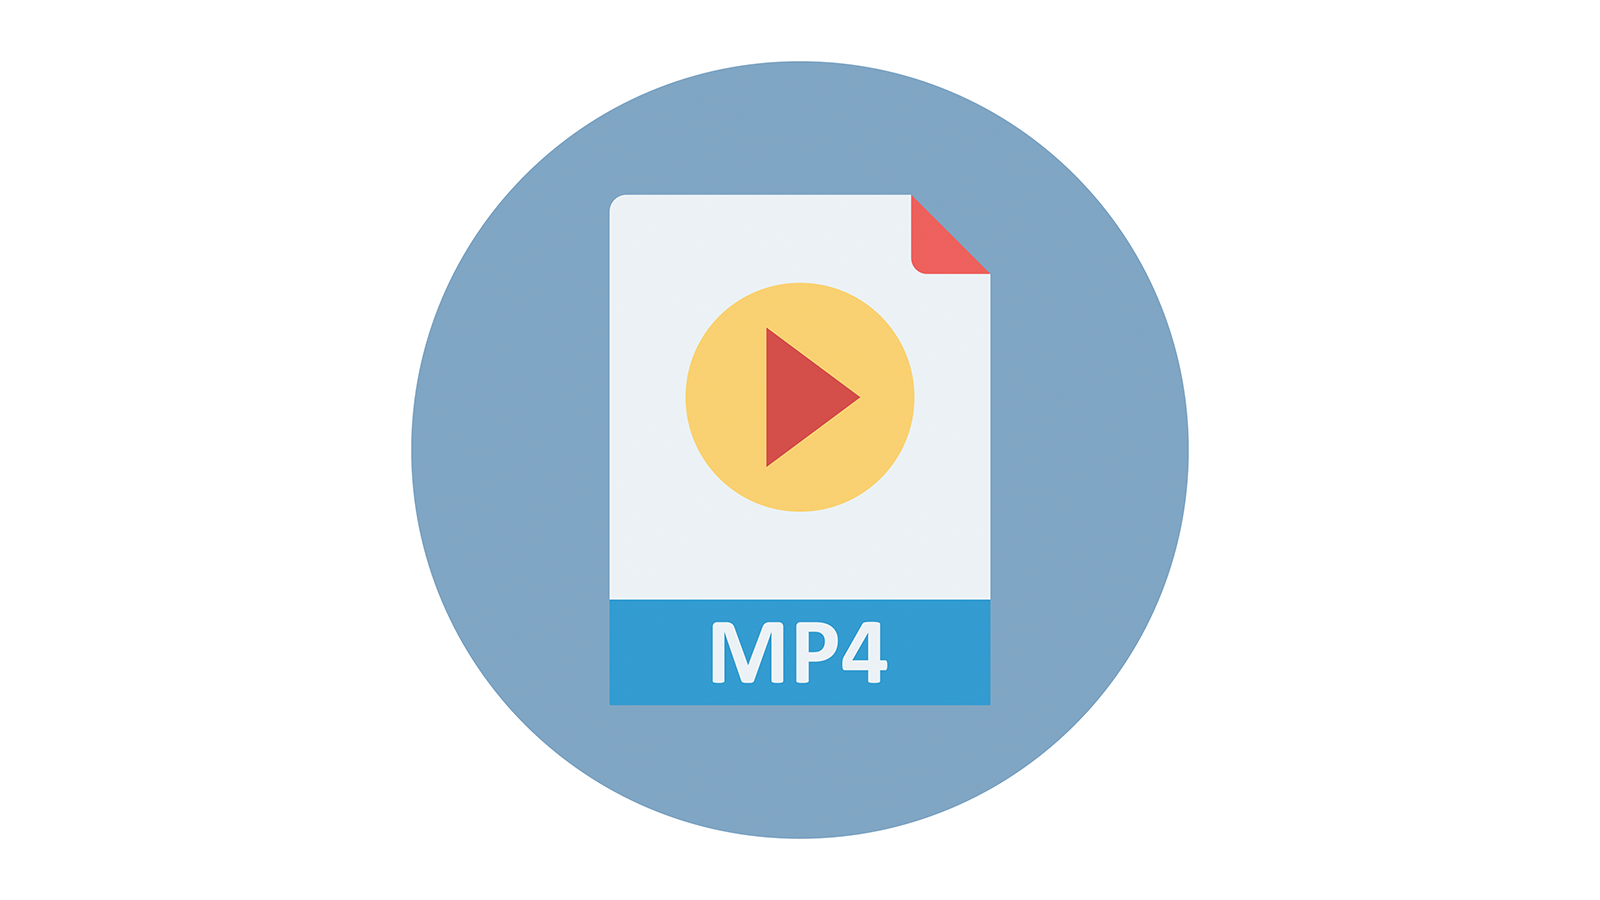 An MP4 file icon.